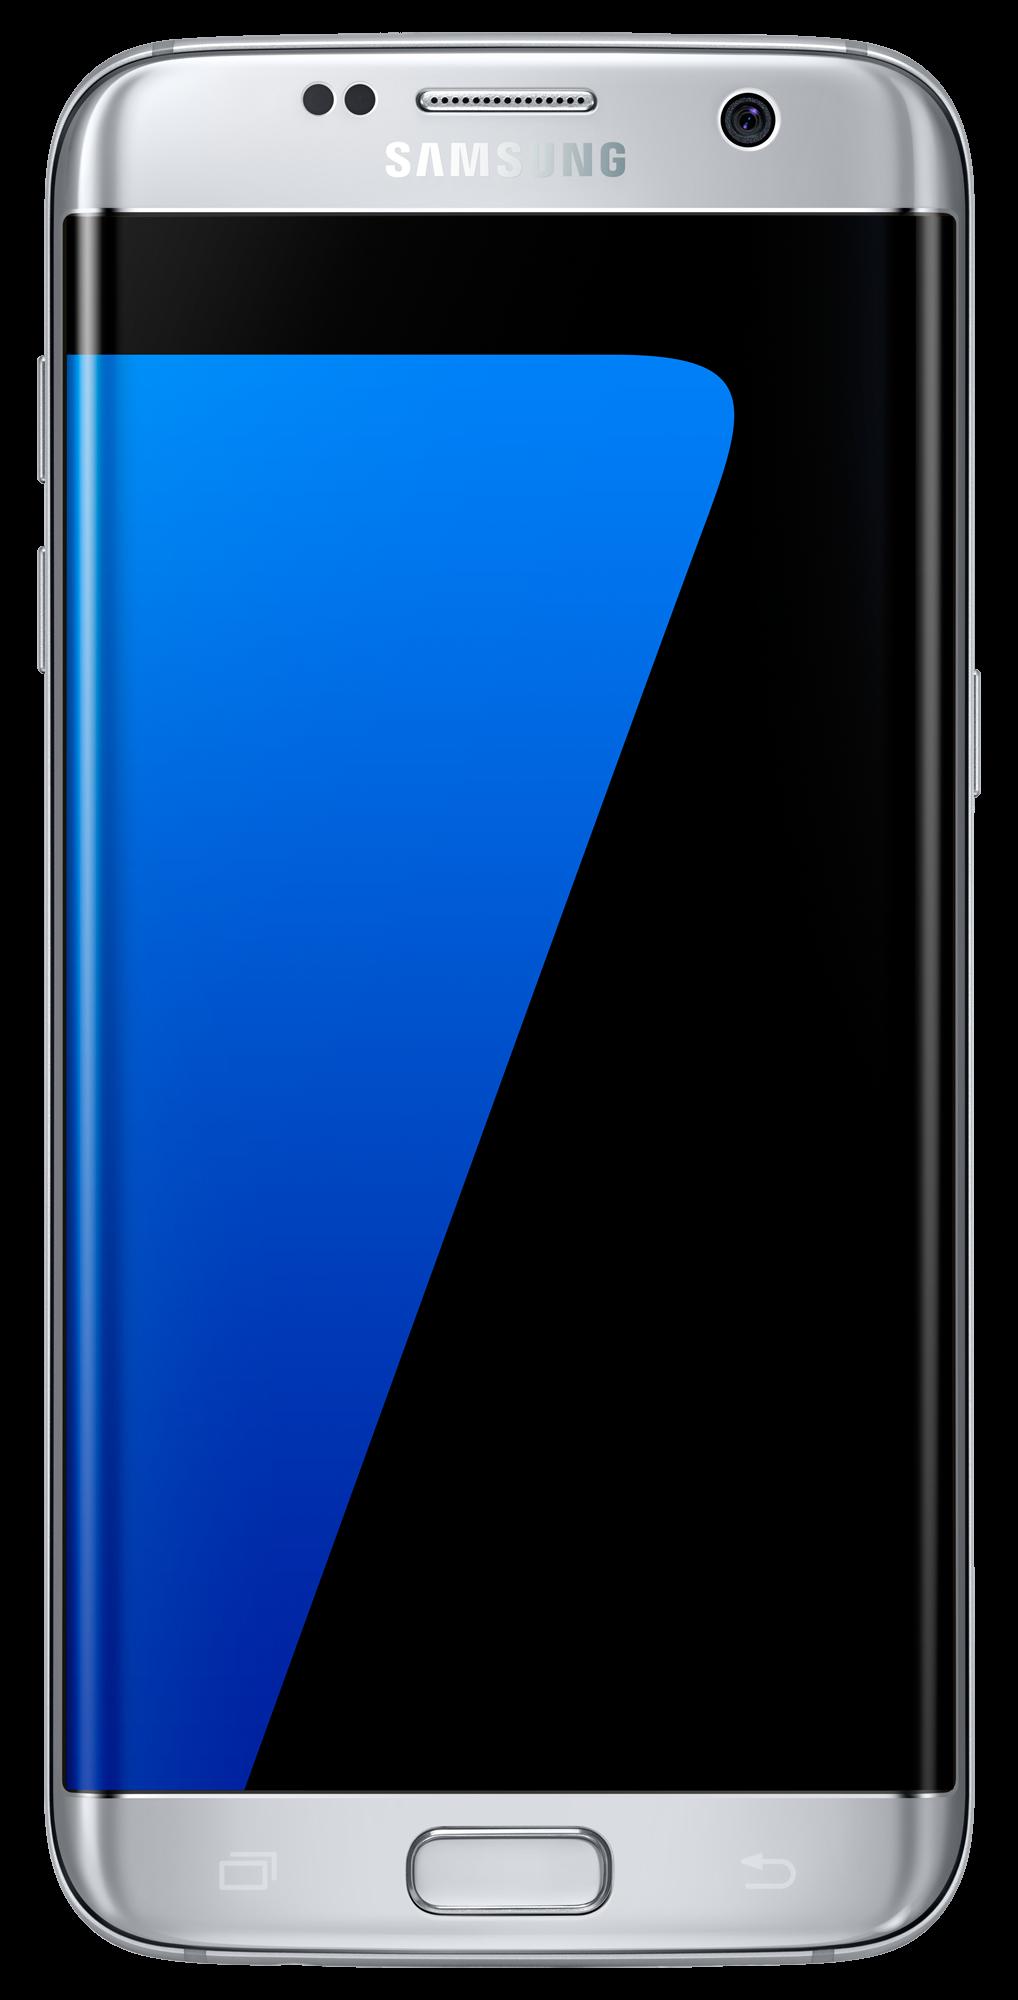 Samsung Galaxy S7 Edge (SM-G935FD) 32Gb Silver TitaniumSamsung<br>Samsung Galaxy S7 Edge (SM-G935FD) 32Gb Silver Titanium<br>